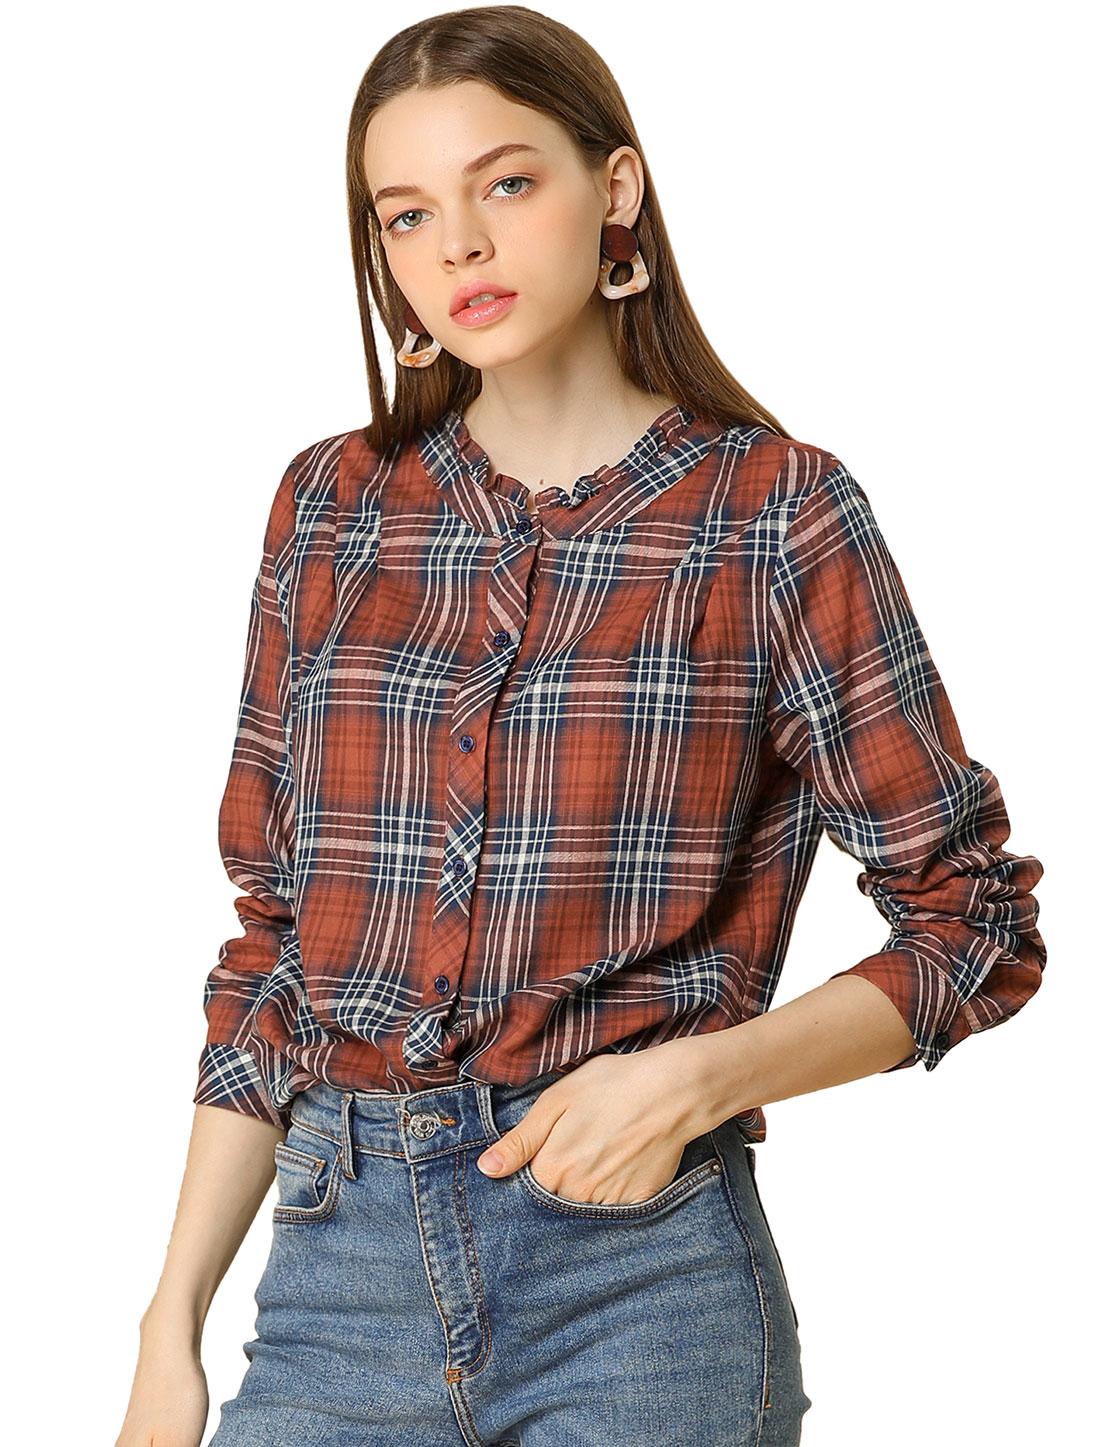 Allegra K Women's Fall Blouse Long Sleeve Ruffle Neck Plaid Shirt Red L